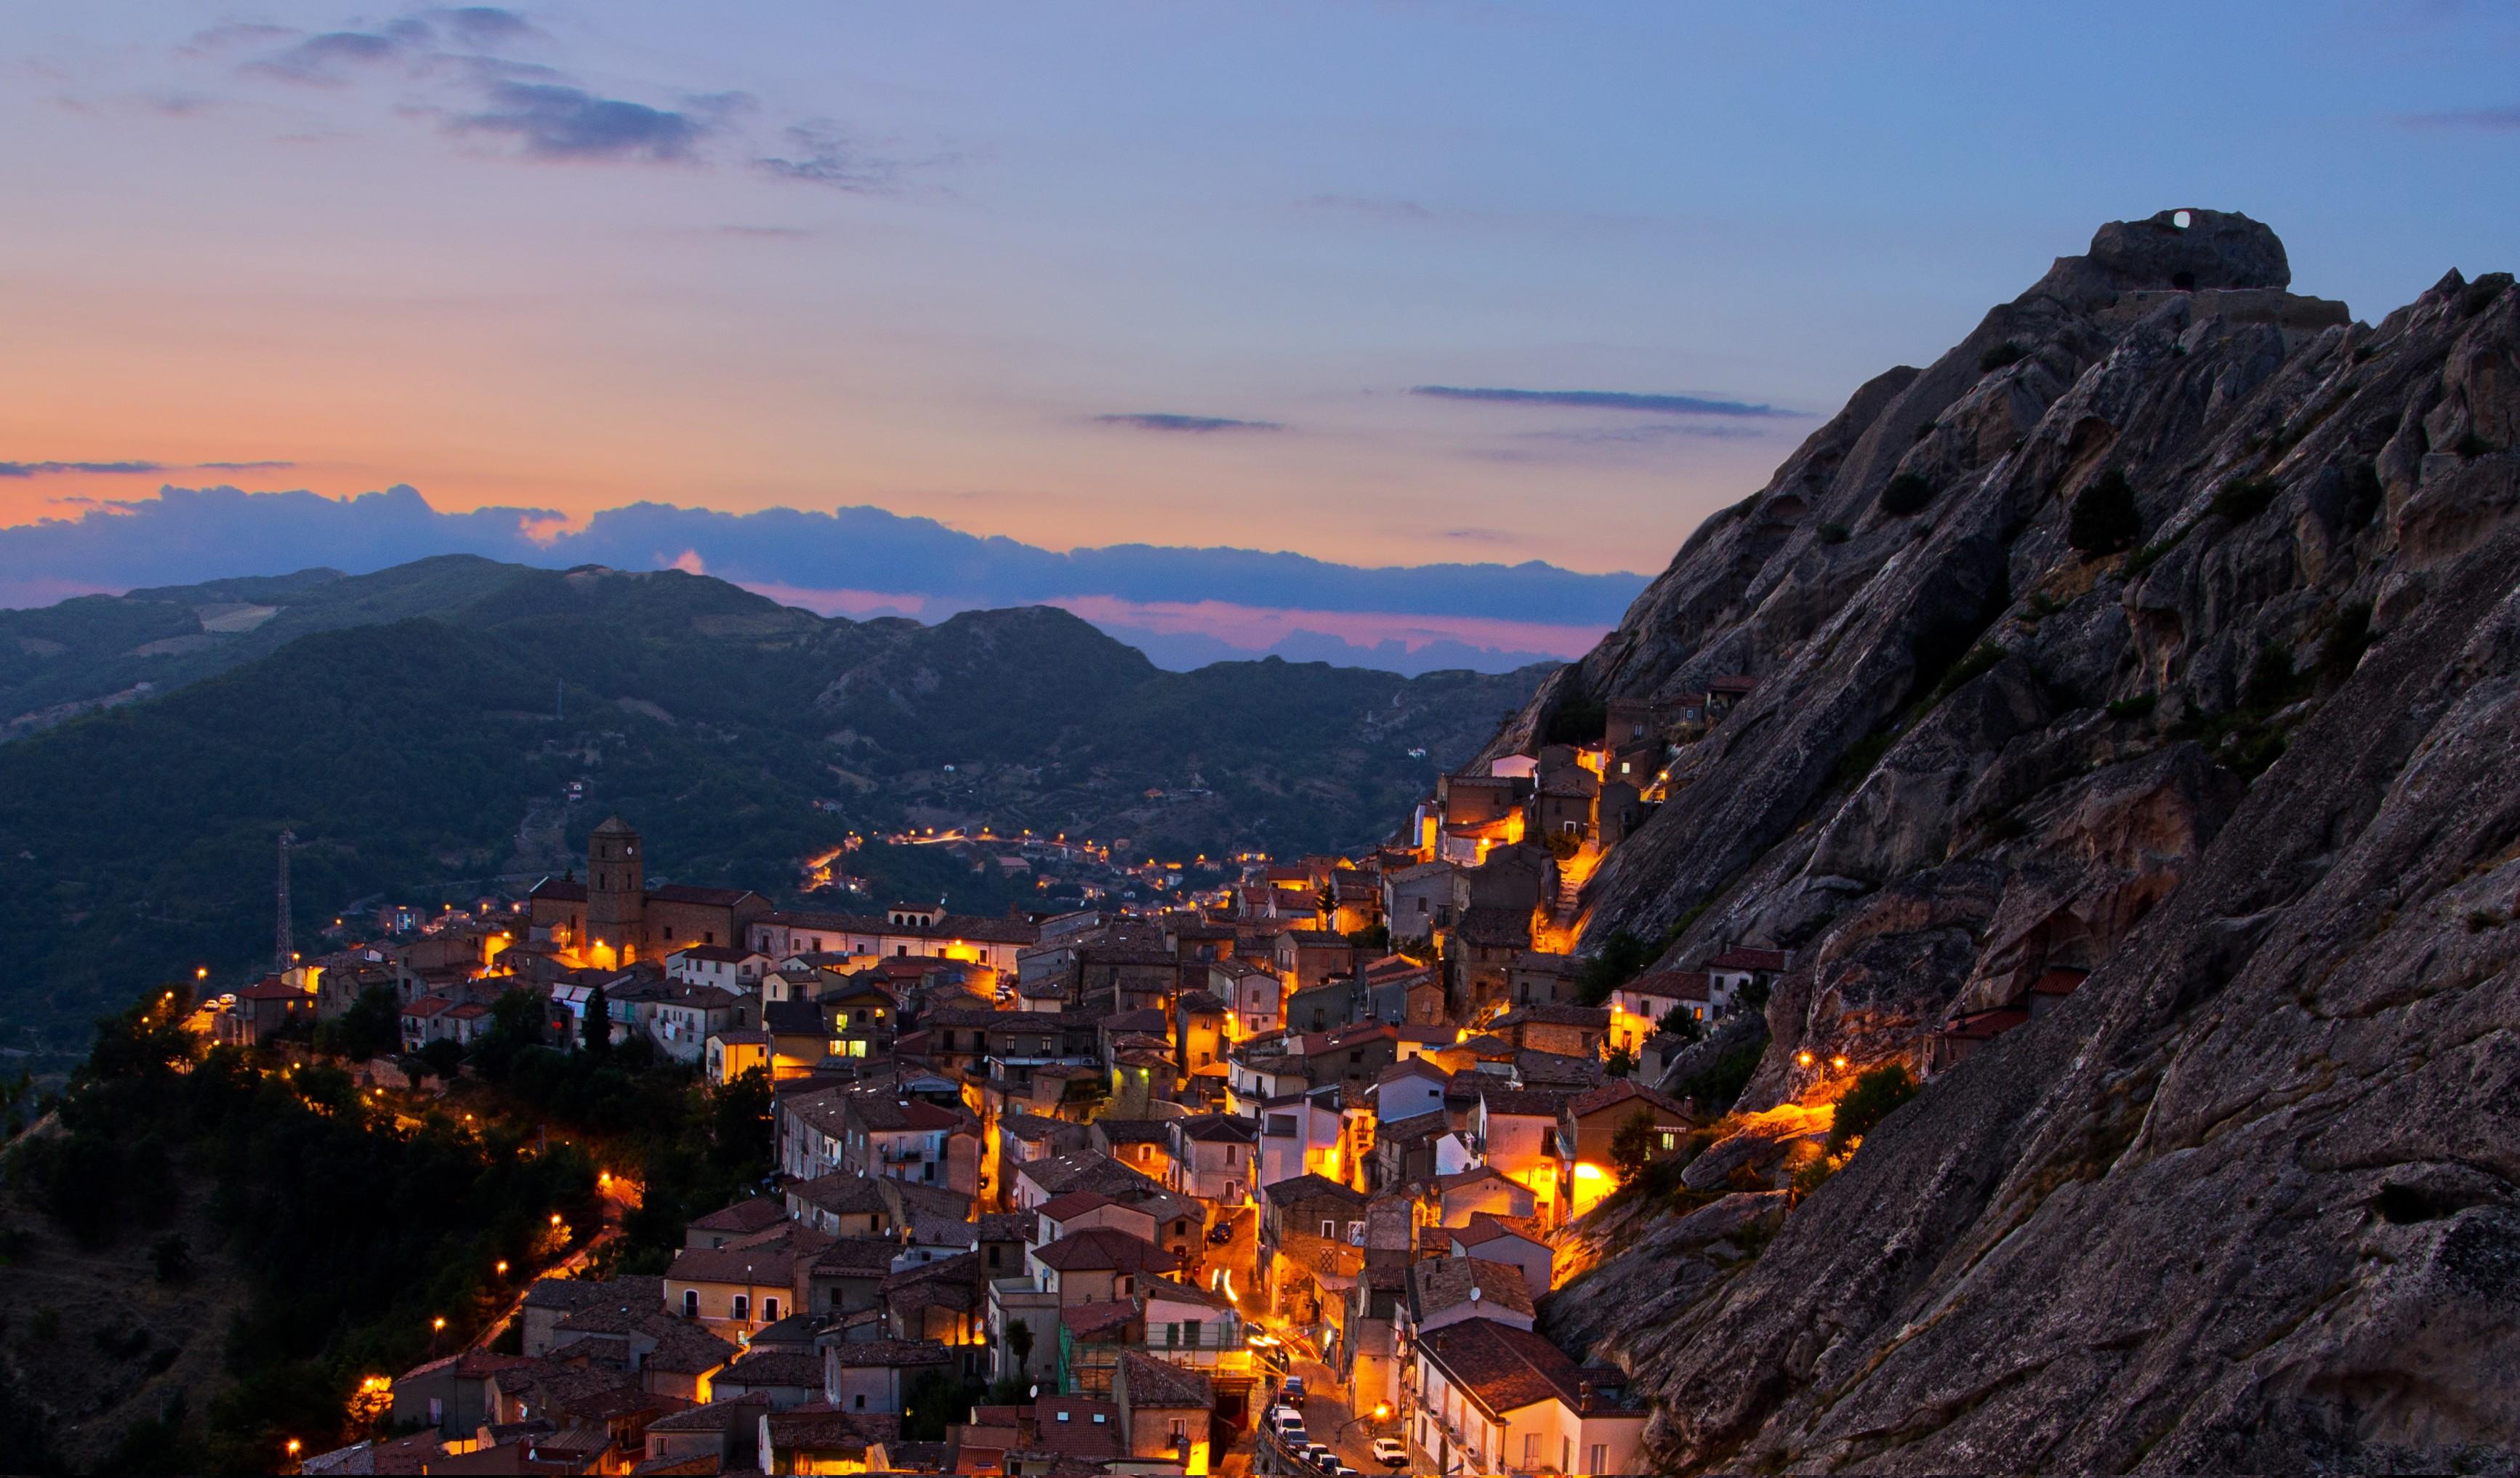 Vista notturna di Pietrapertosa nelle Dolomiti Lucane